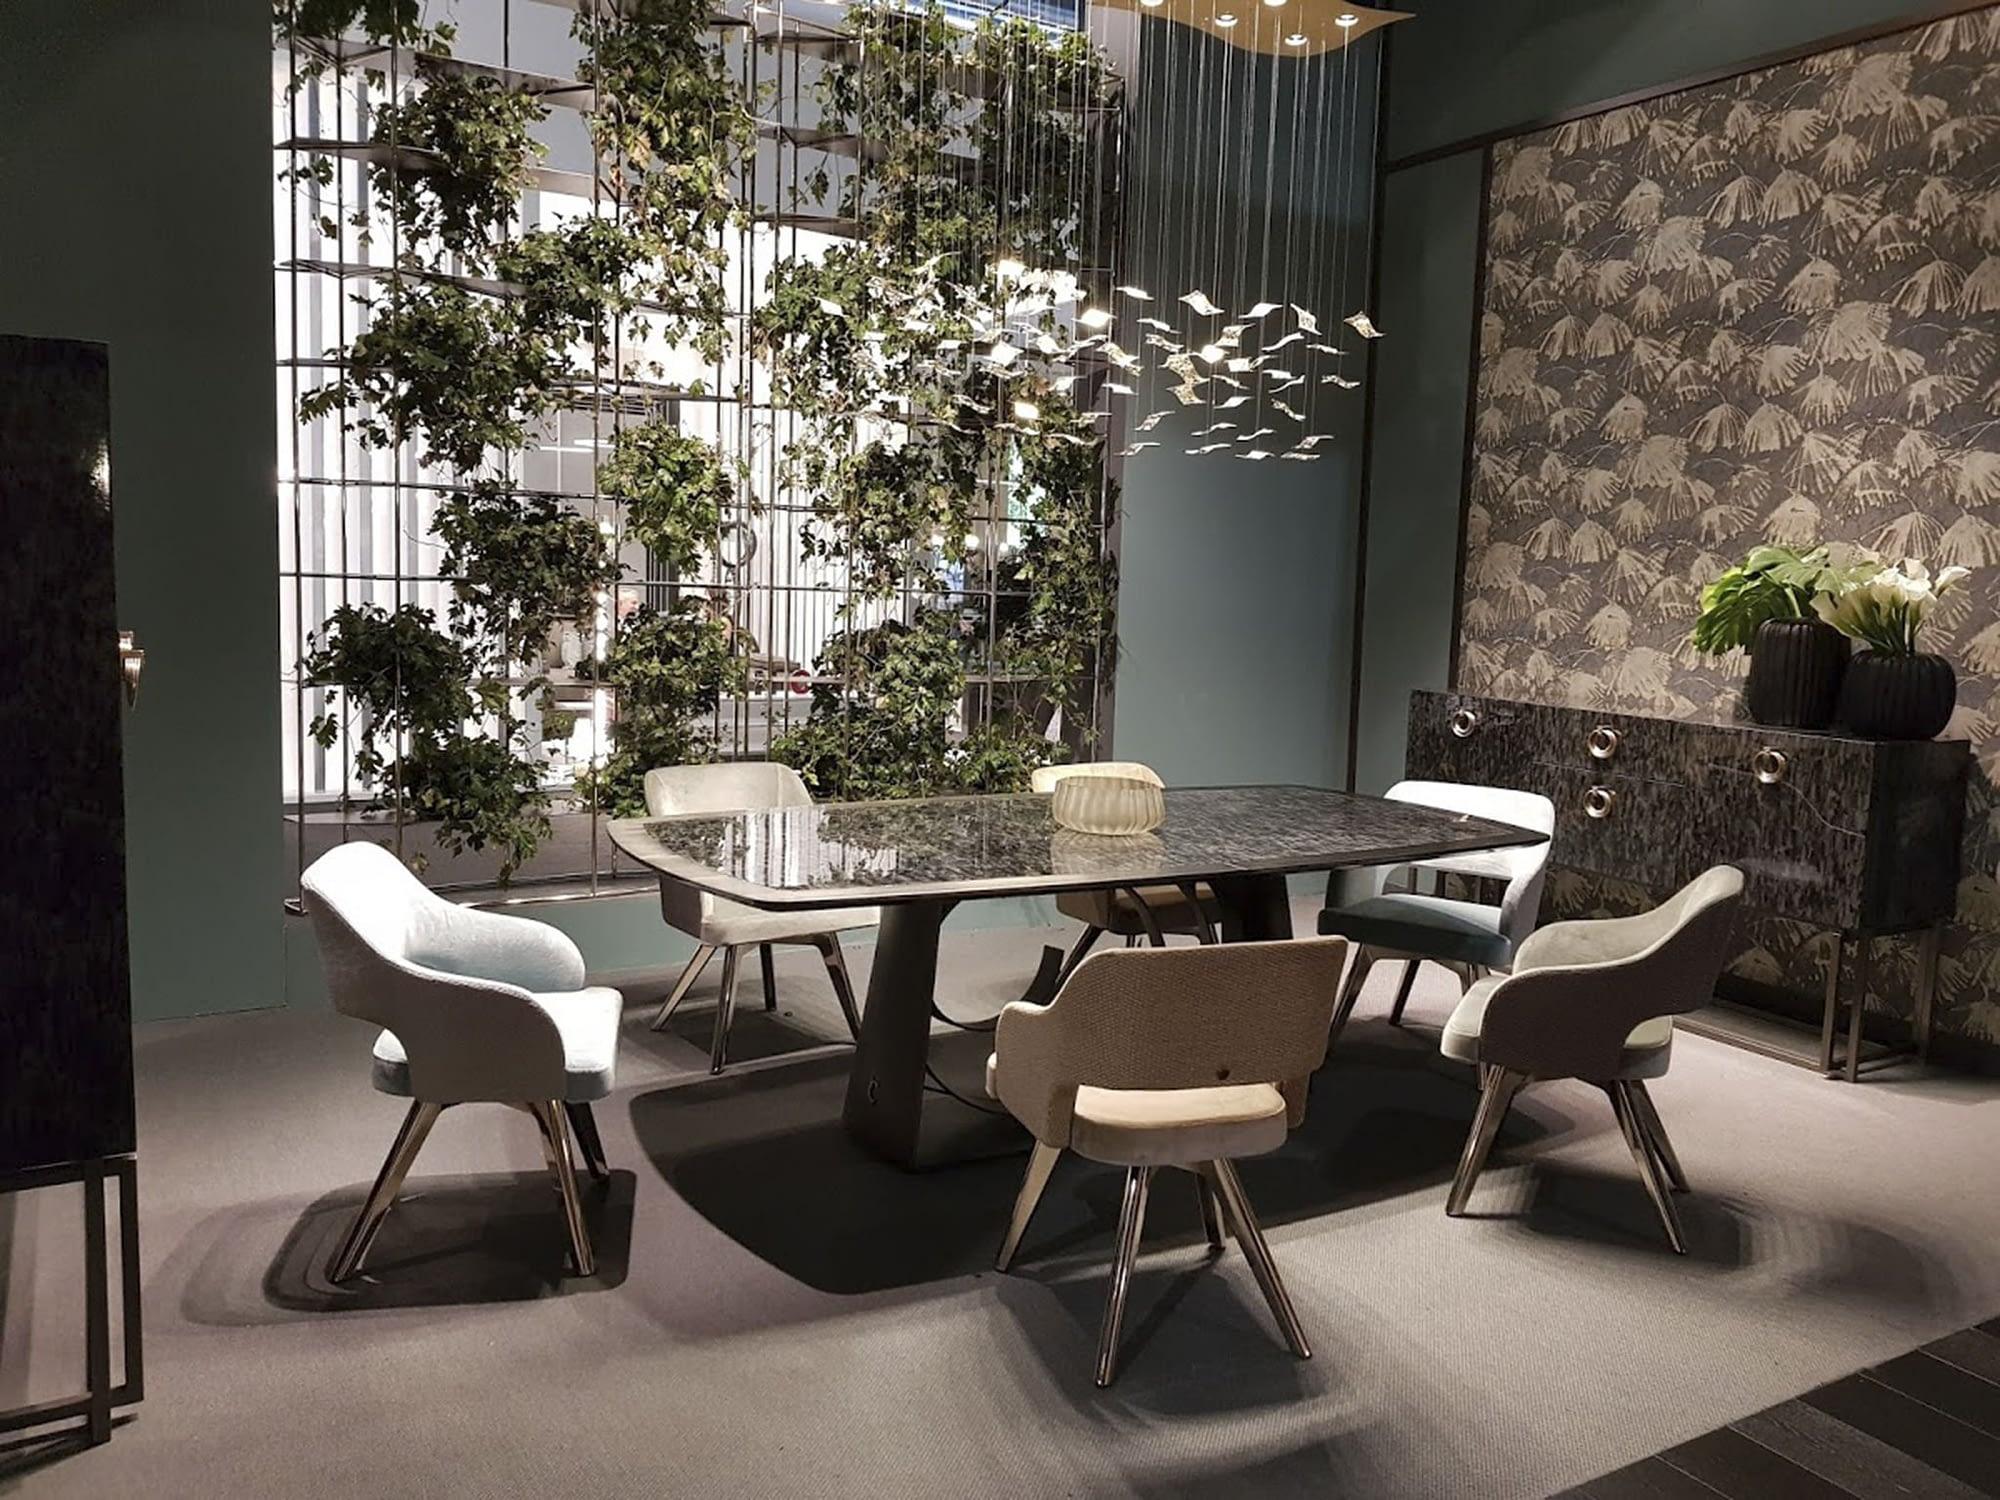 Milano Design Week 2018 - Salone del Mobile 13